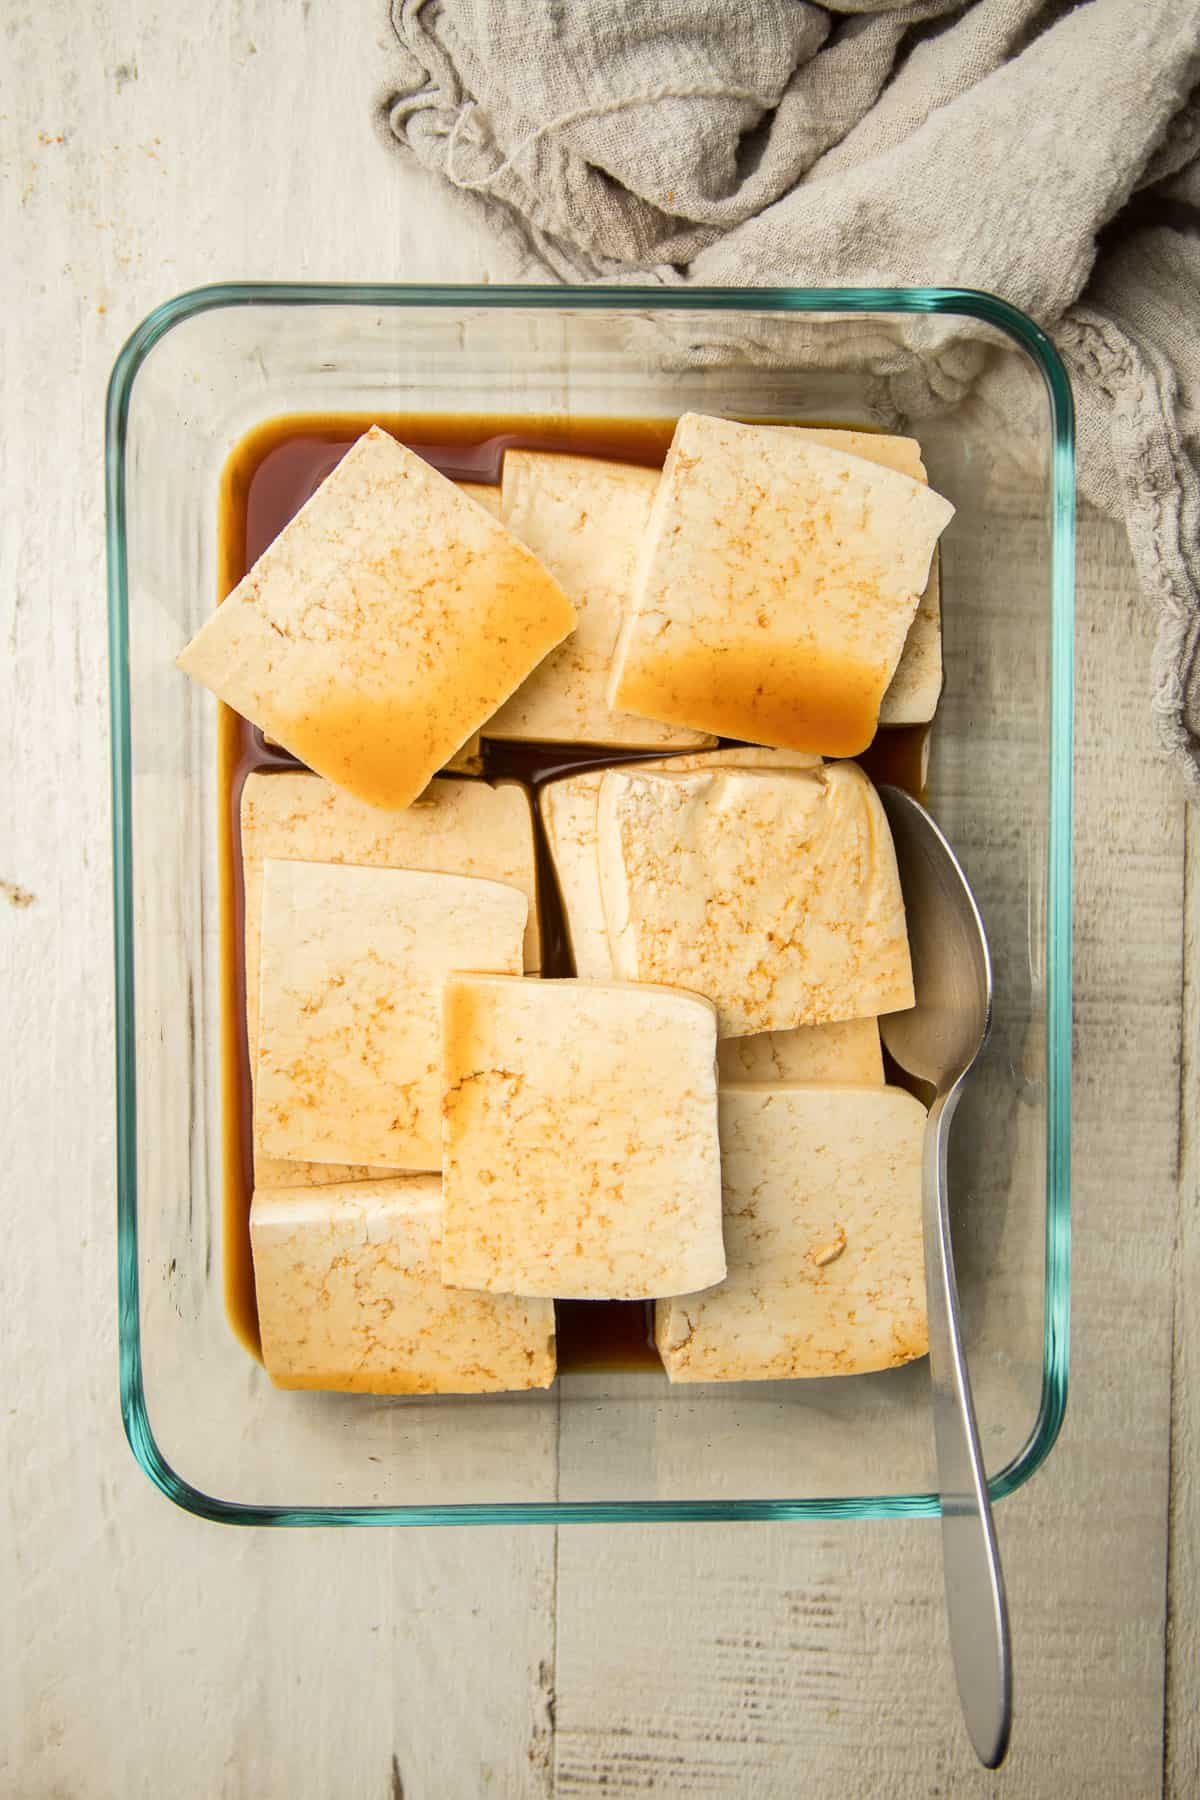 Tofu Marinating in a Glass Dish